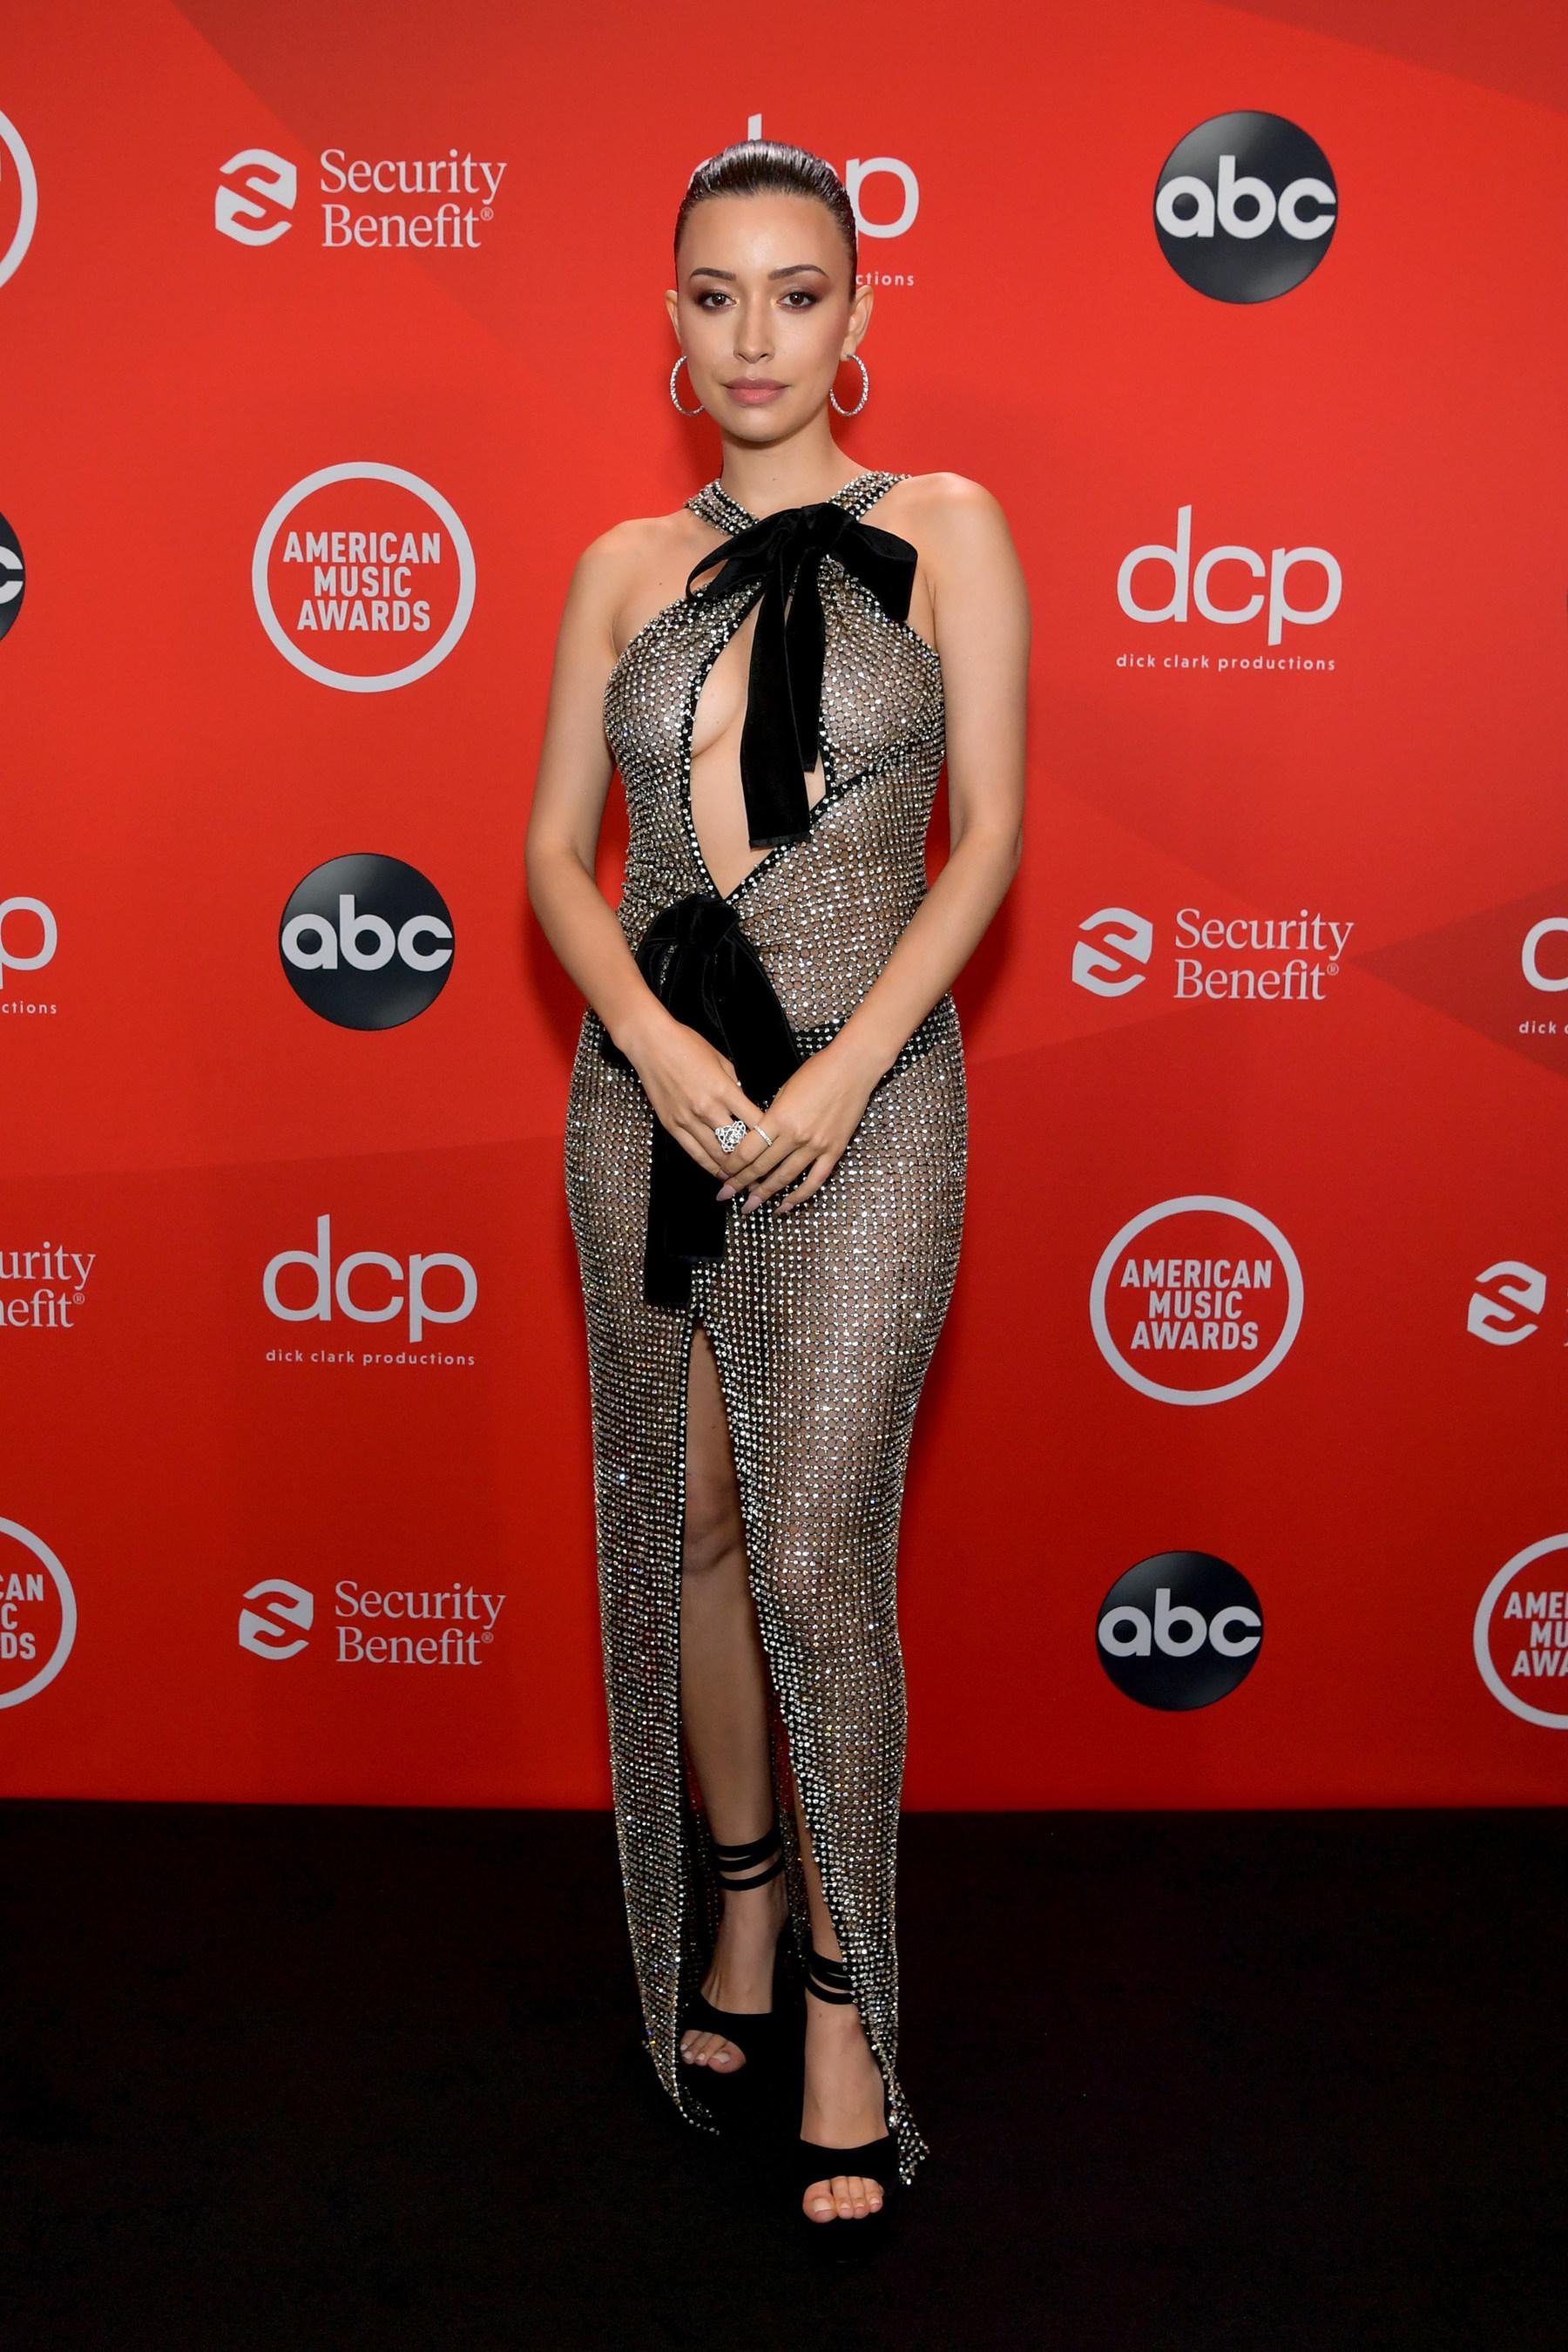 Christian Serratos Sparkles in Forevermark Diamonds at the 2020 American  Music Awards